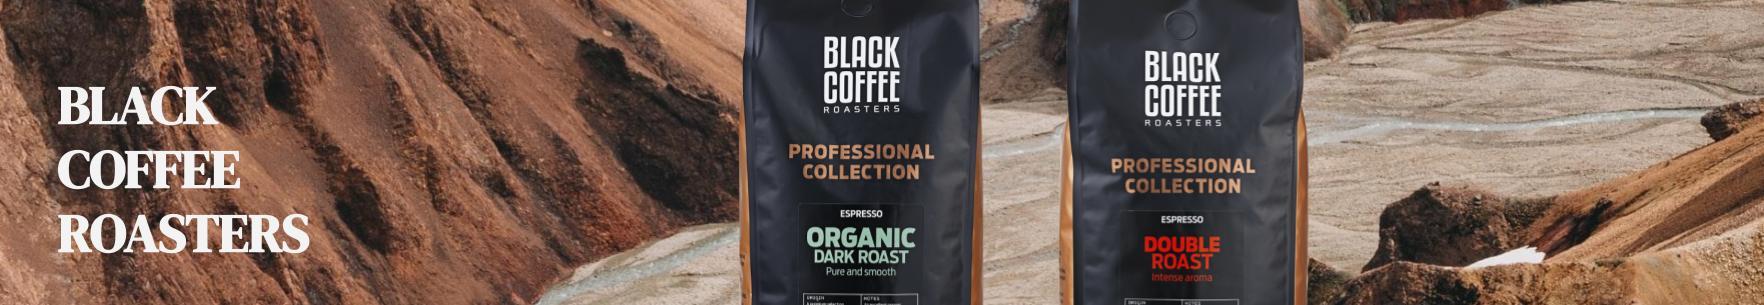 Black Coffee Roasters Kaffe